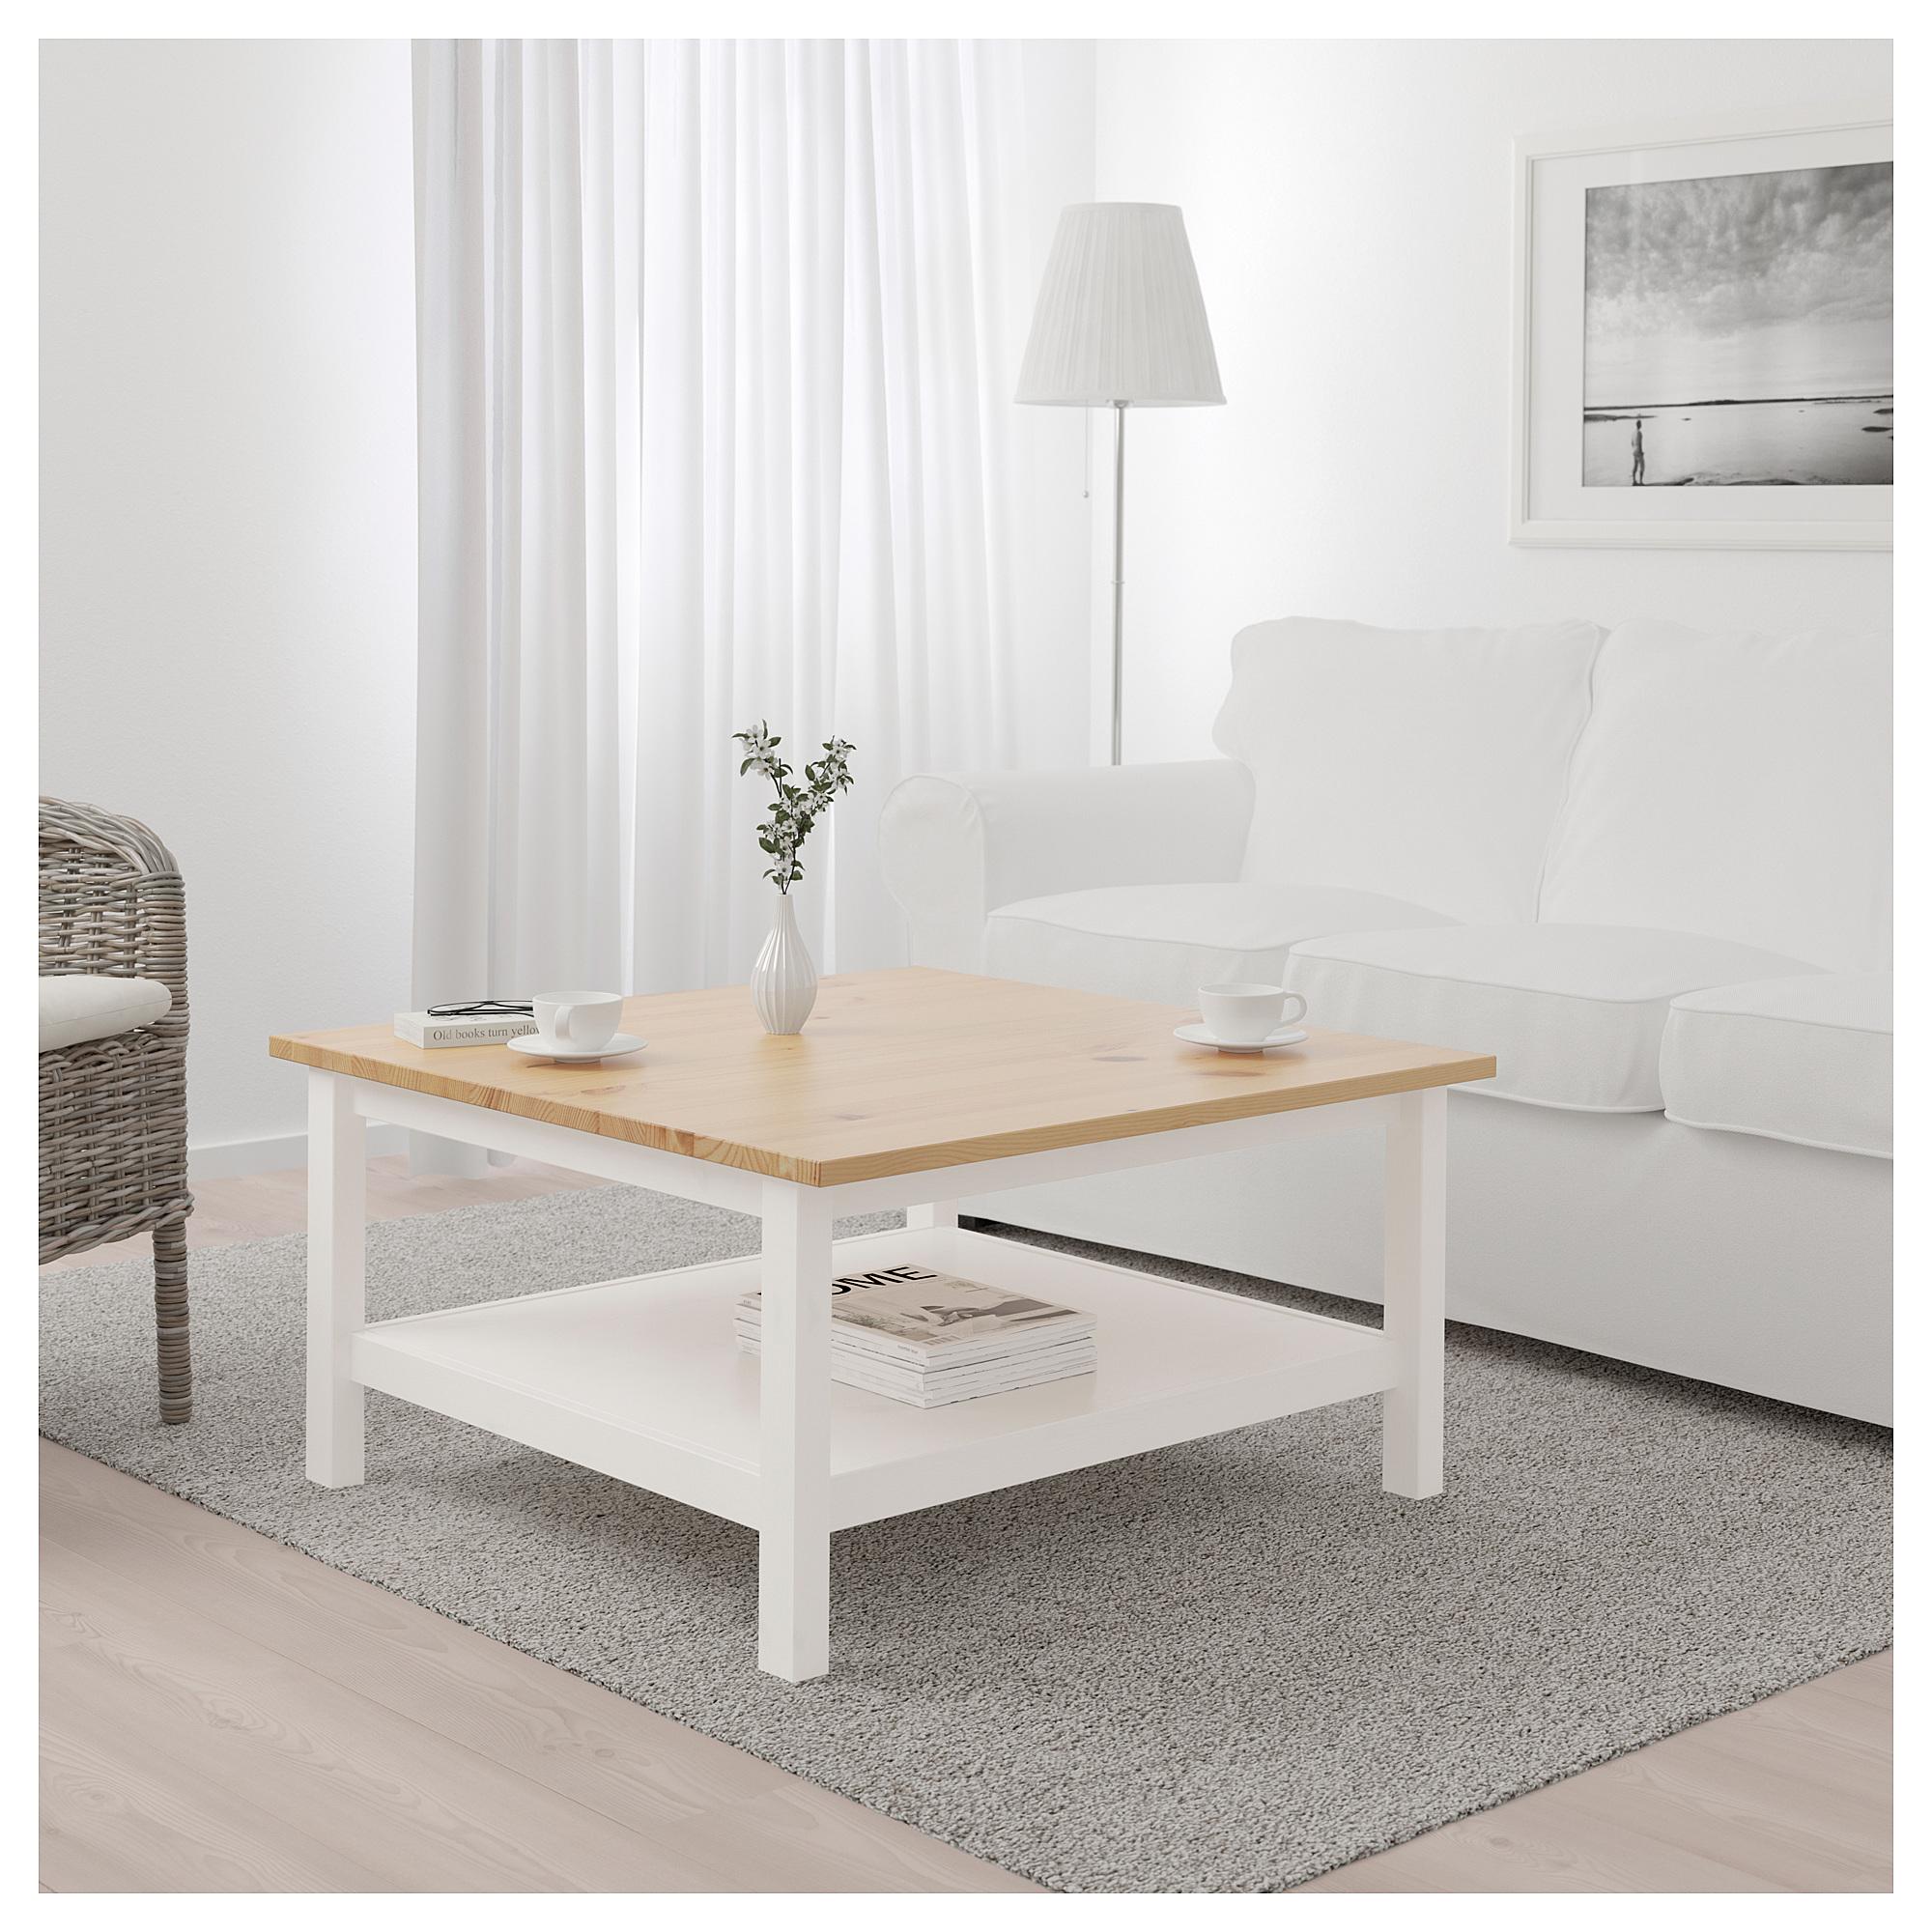 Awe Inspiring Ikea Hemnes Coffee Table White Stain Light Brown In 2019 Cjindustries Chair Design For Home Cjindustriesco